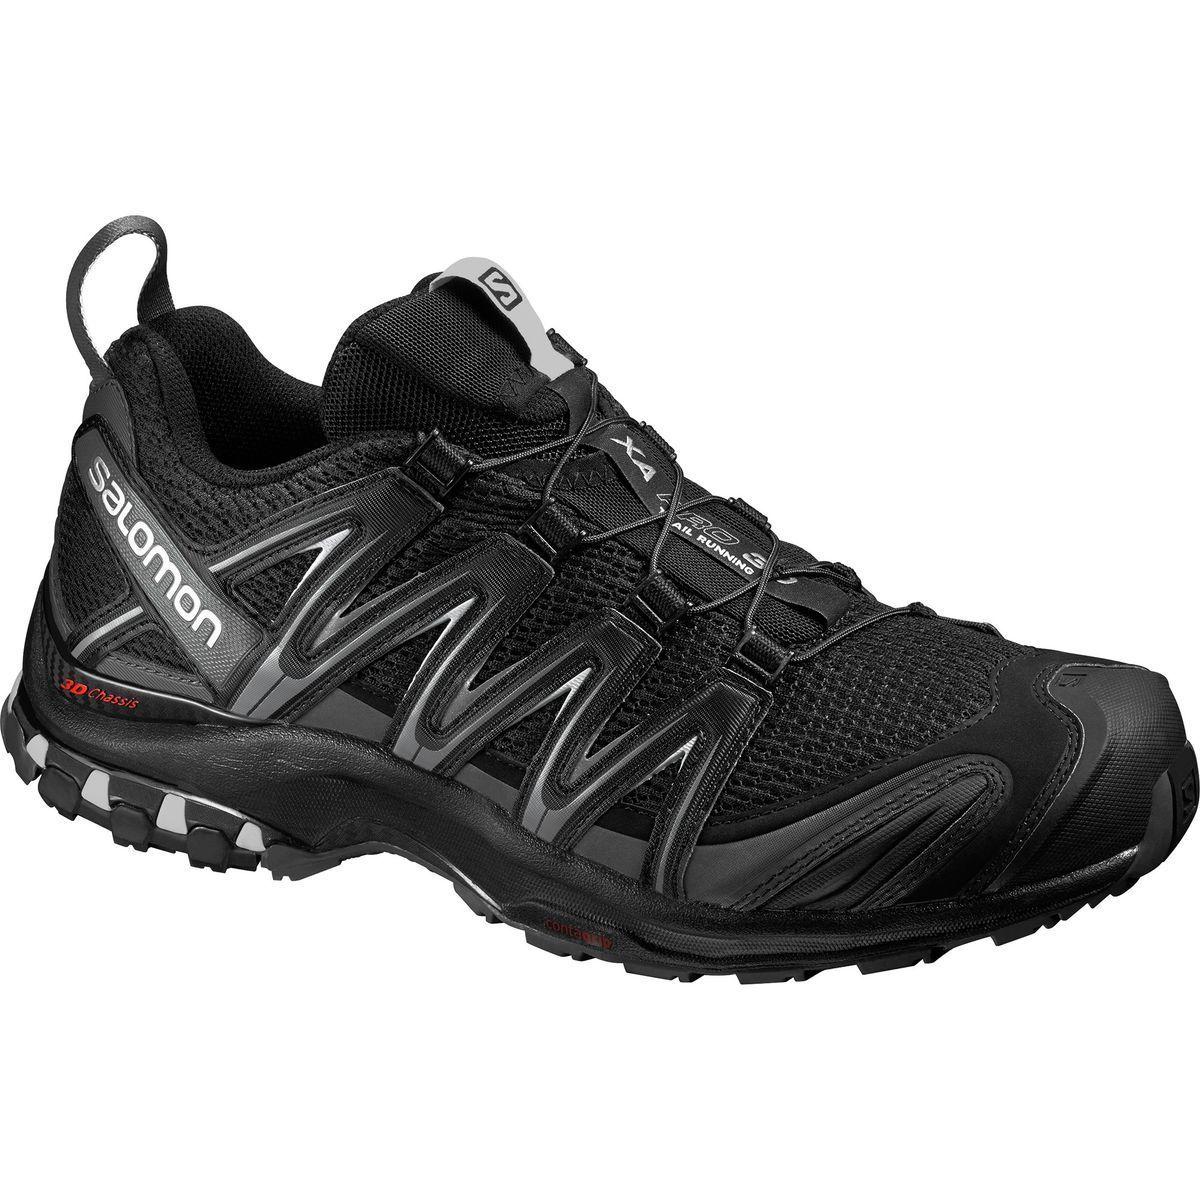 Salomon Xa Pro 3d Wide Trail Running Shoe Men S Hikingtrails Mens Trail Running Shoes Running Shoes Trail Shoes